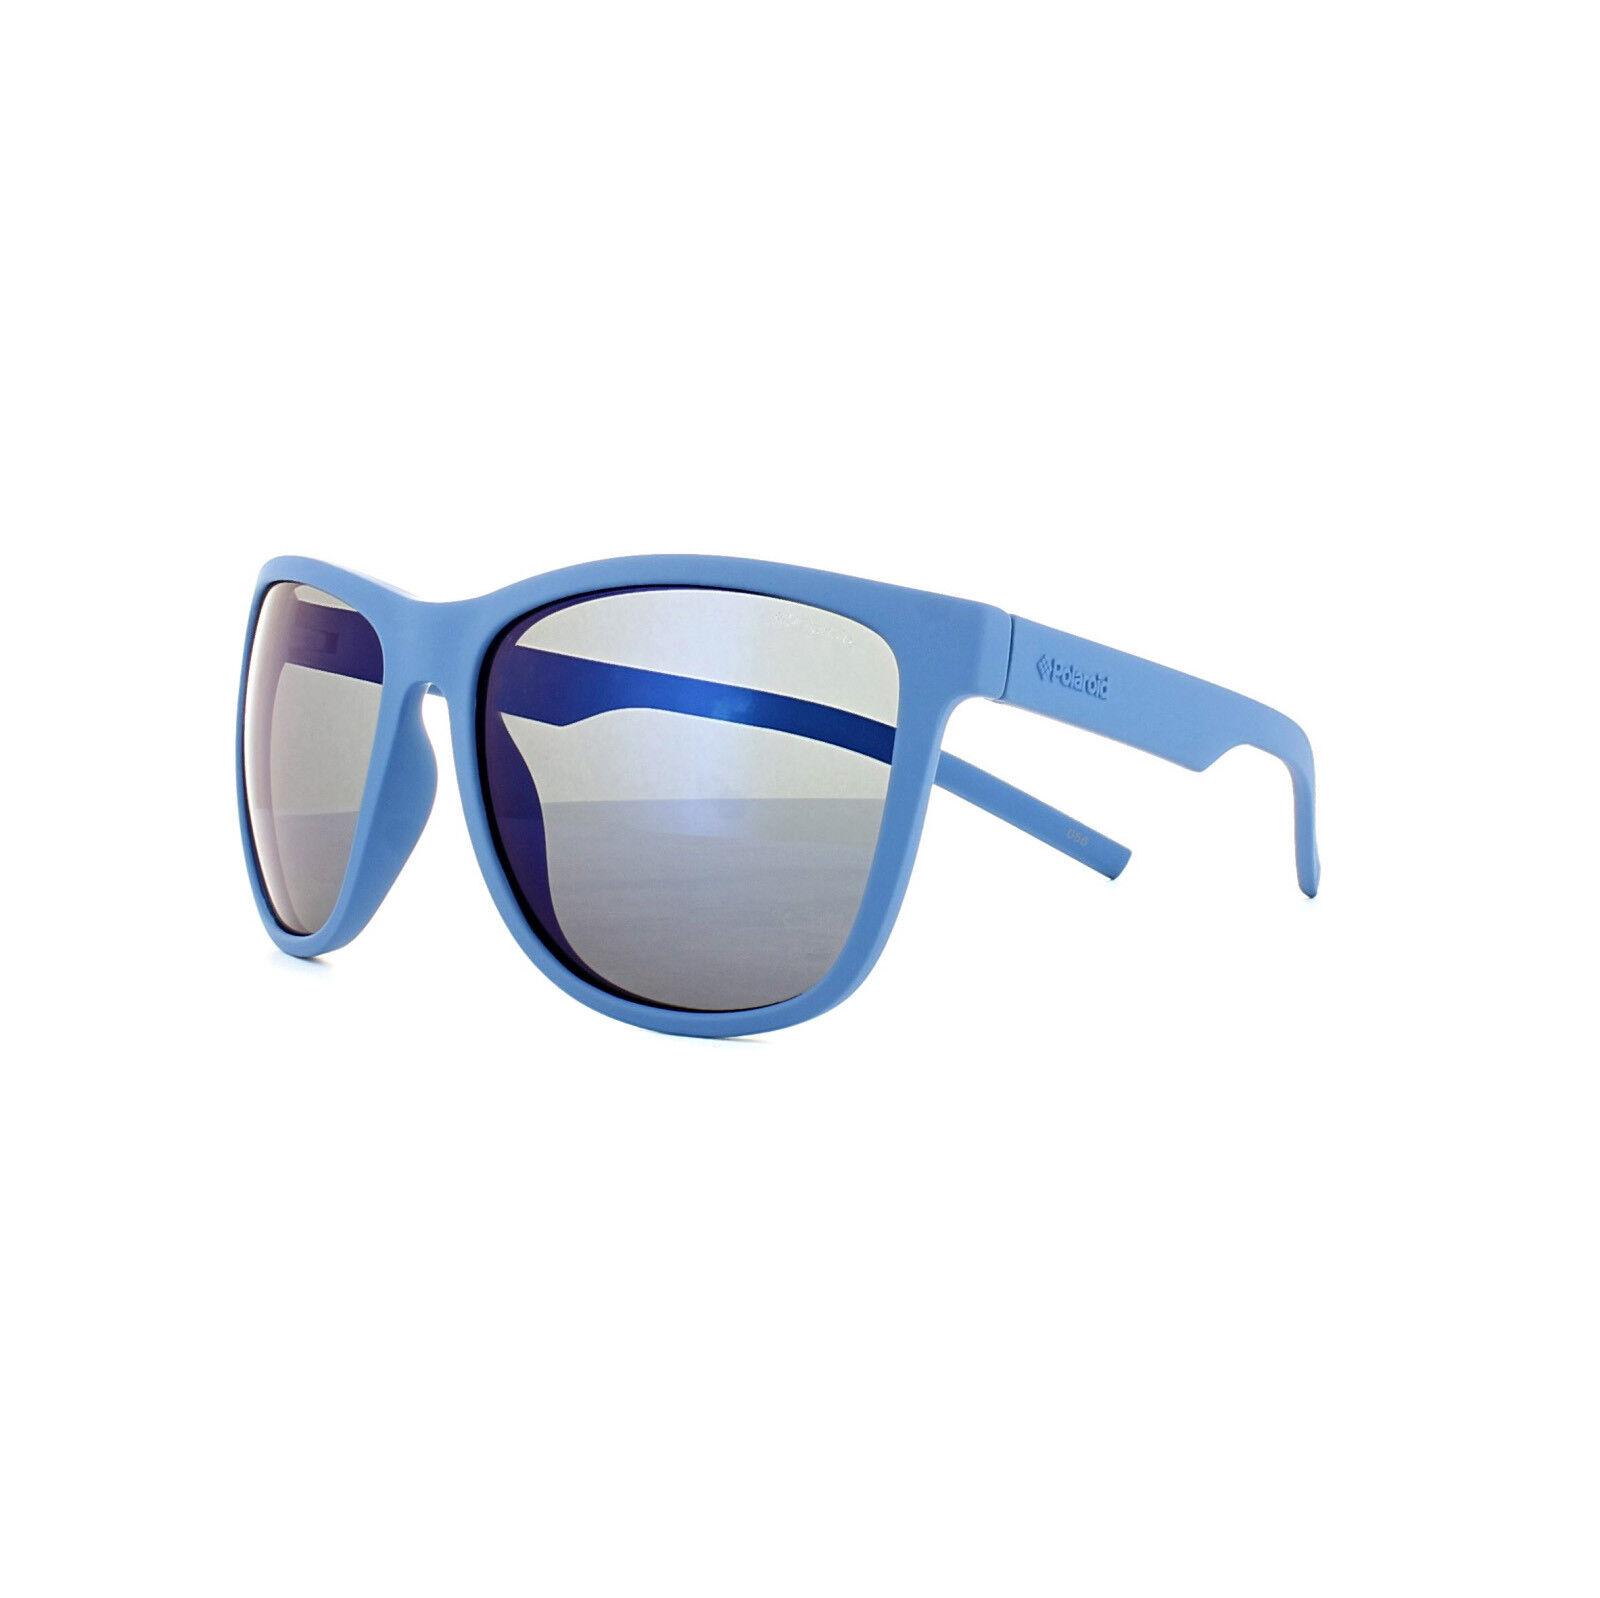 88948445d30 Sunglasses Polaroid PLD 6014 s Blue Grey Polarized Zdi jy